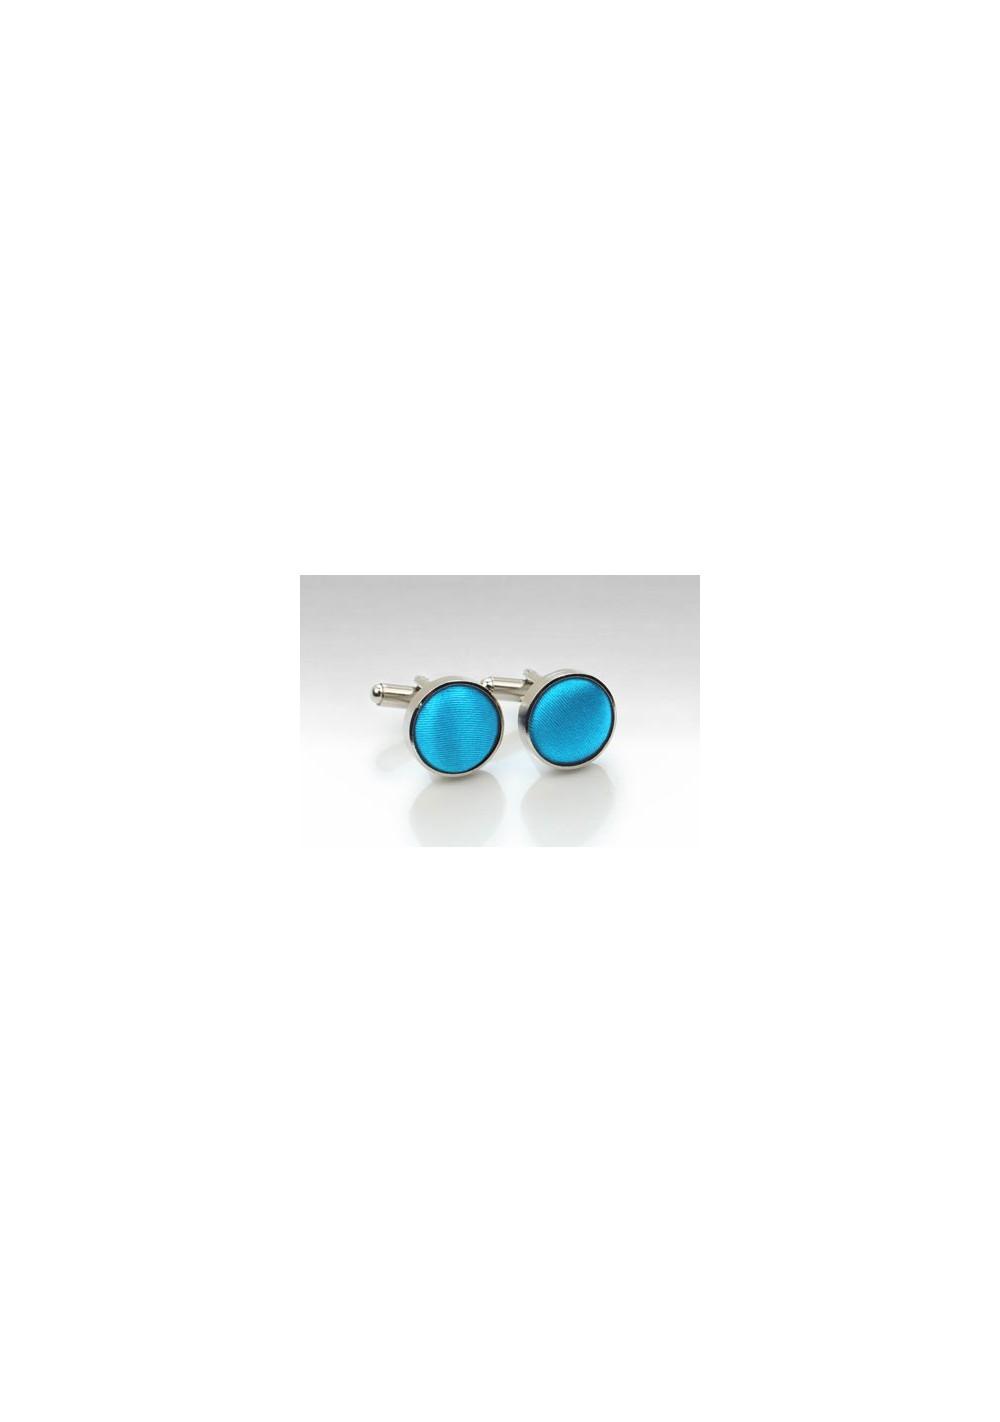 Cyan Blue Cufflinks